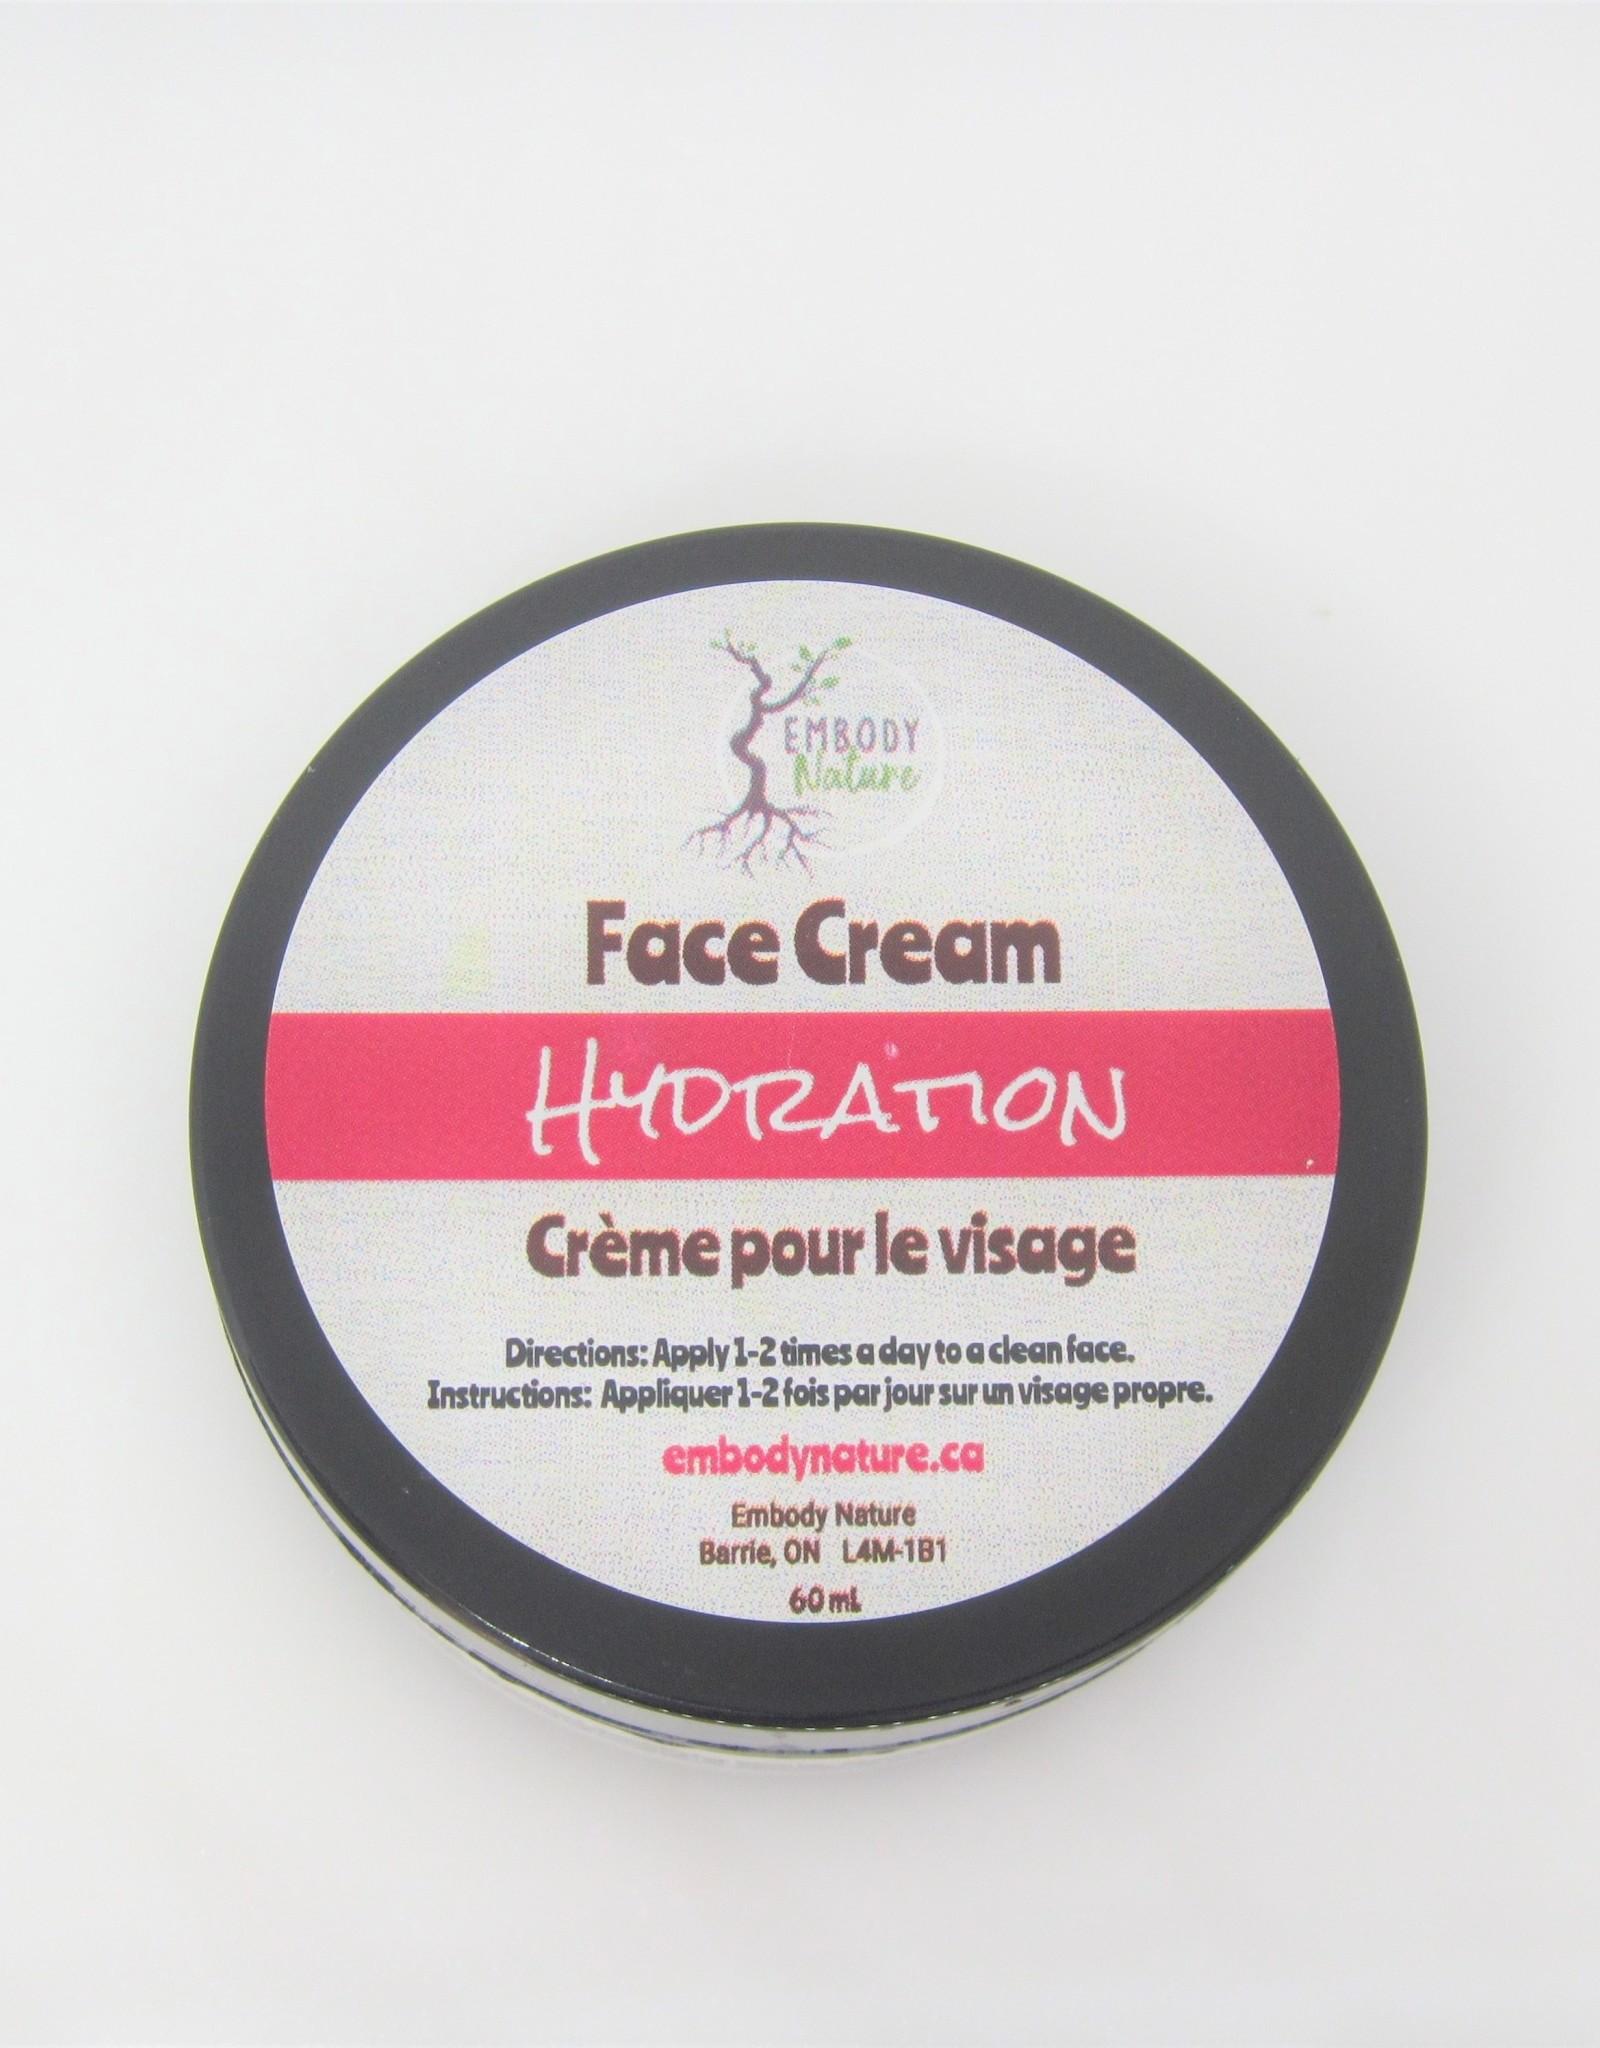 Embody Nature Hydration Face Cream